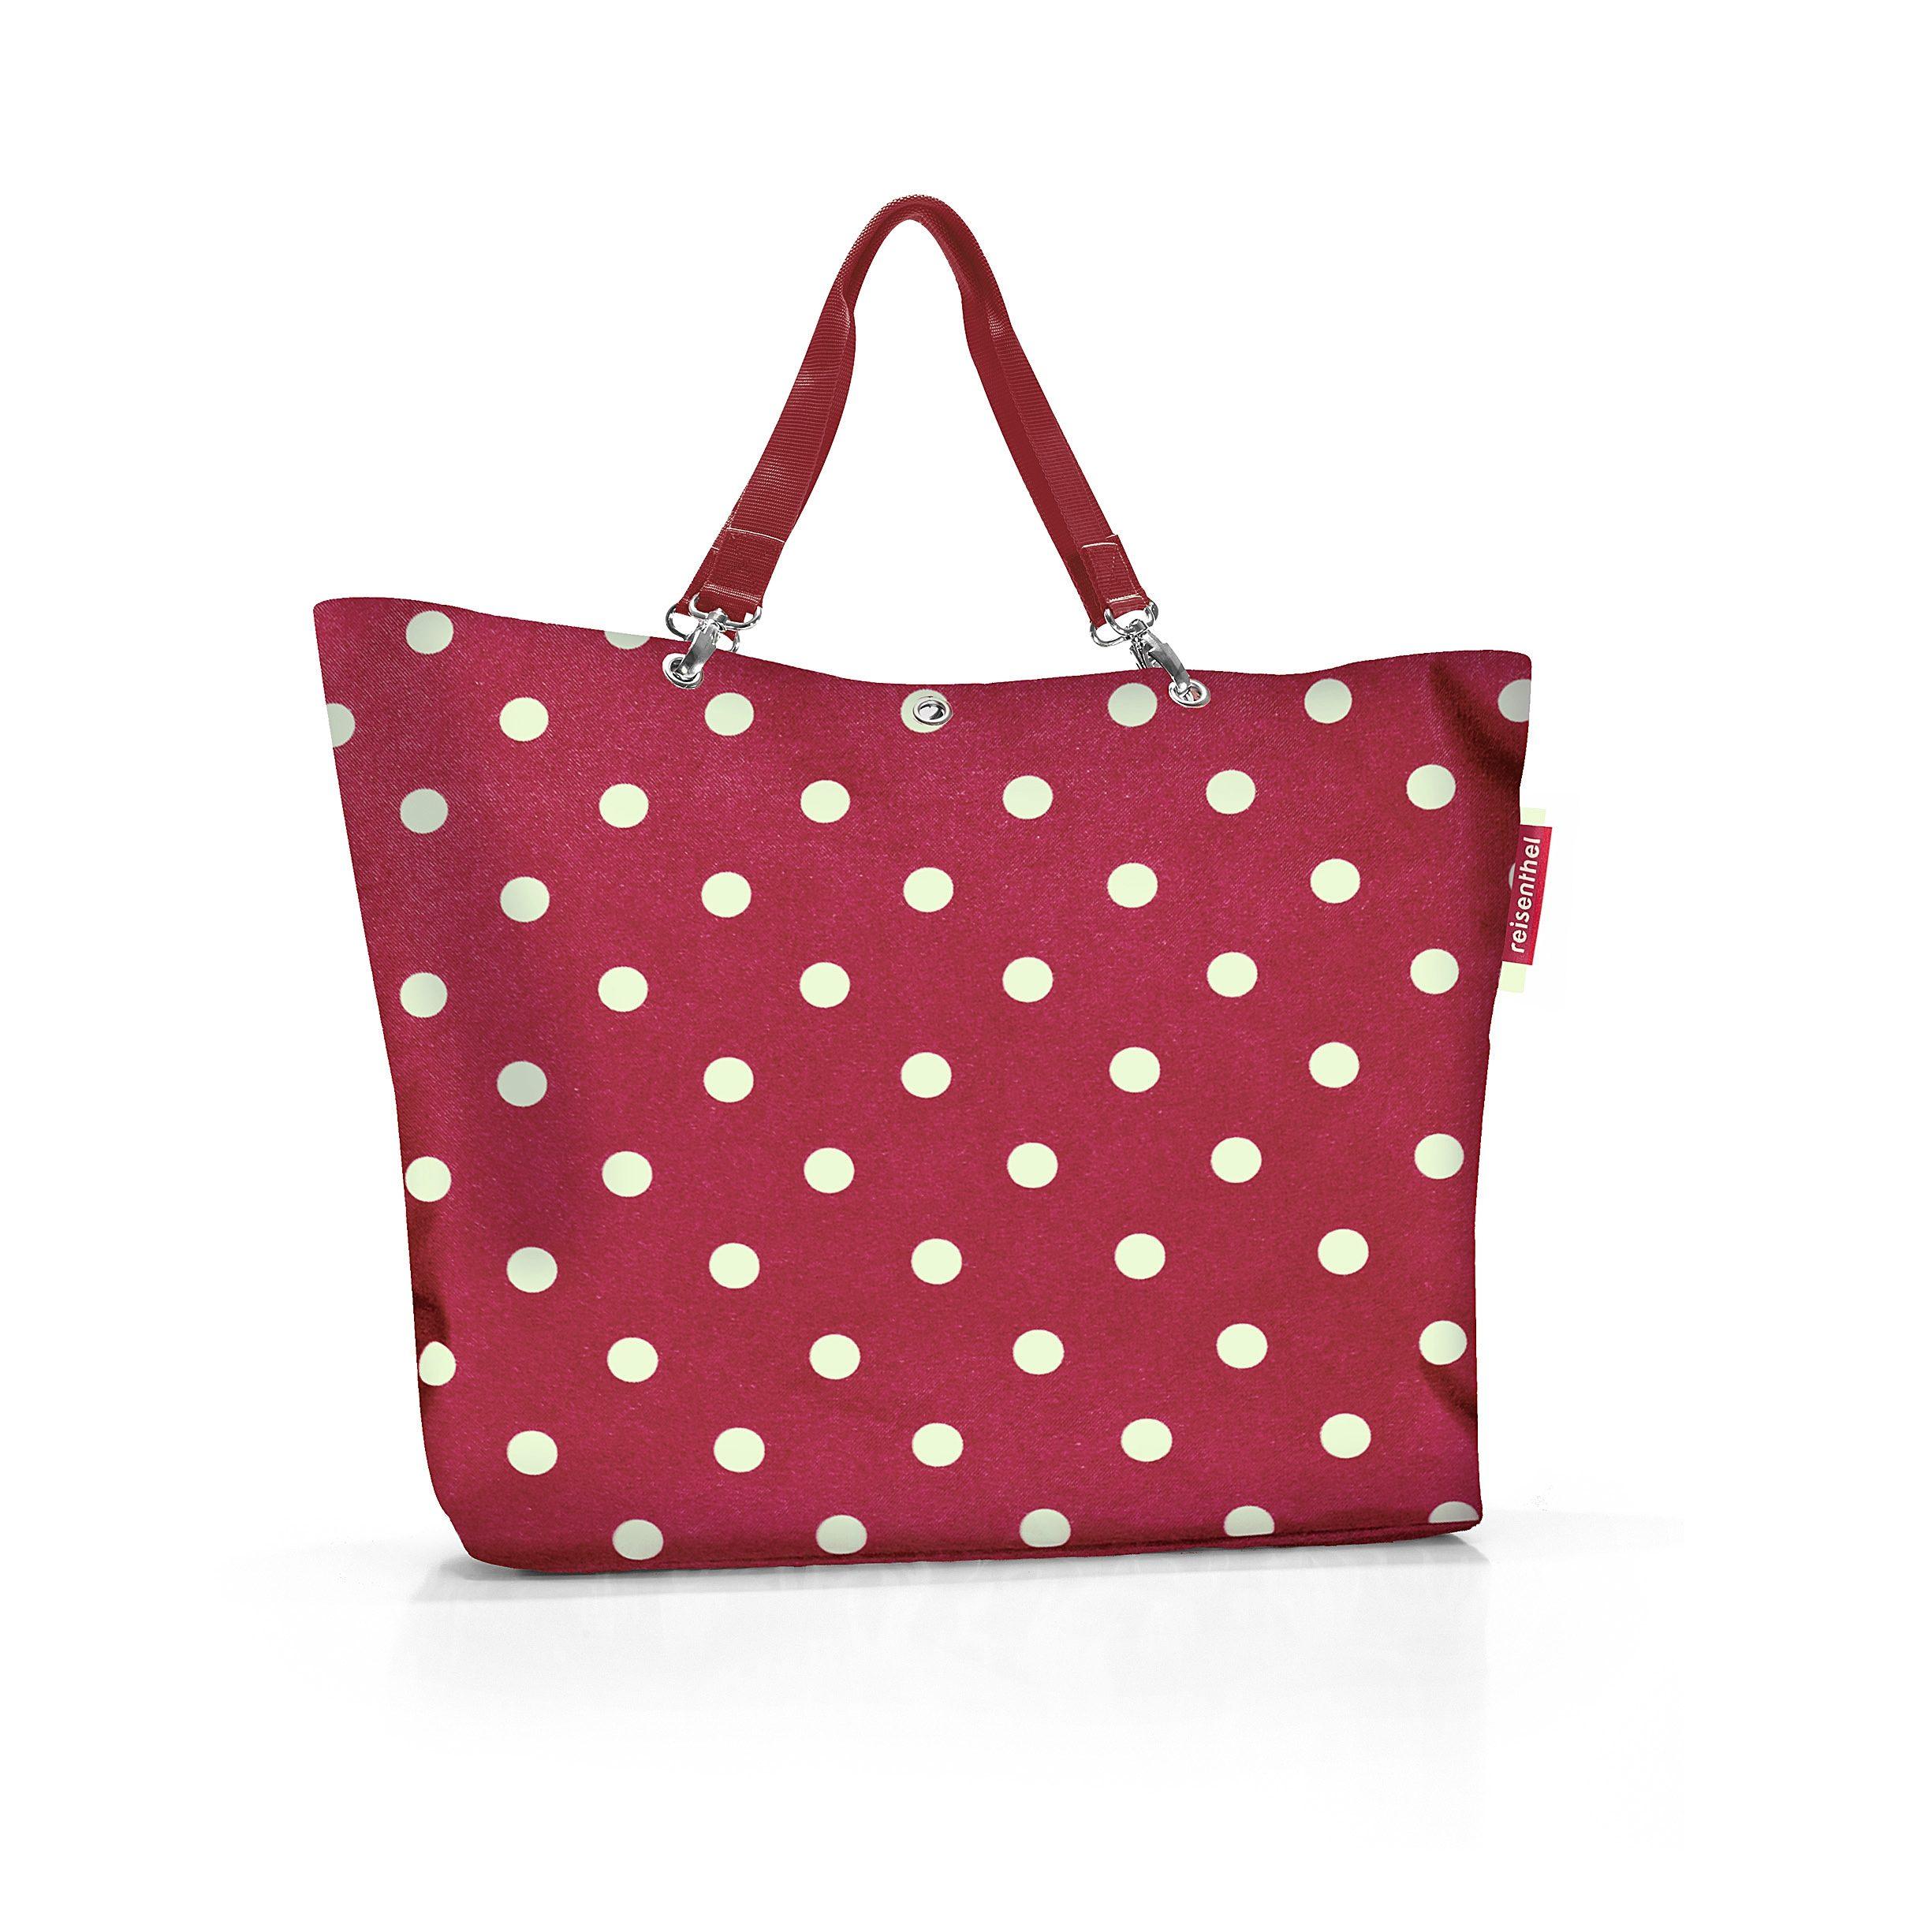 REISENTHEL® Shopper XL ruby dots